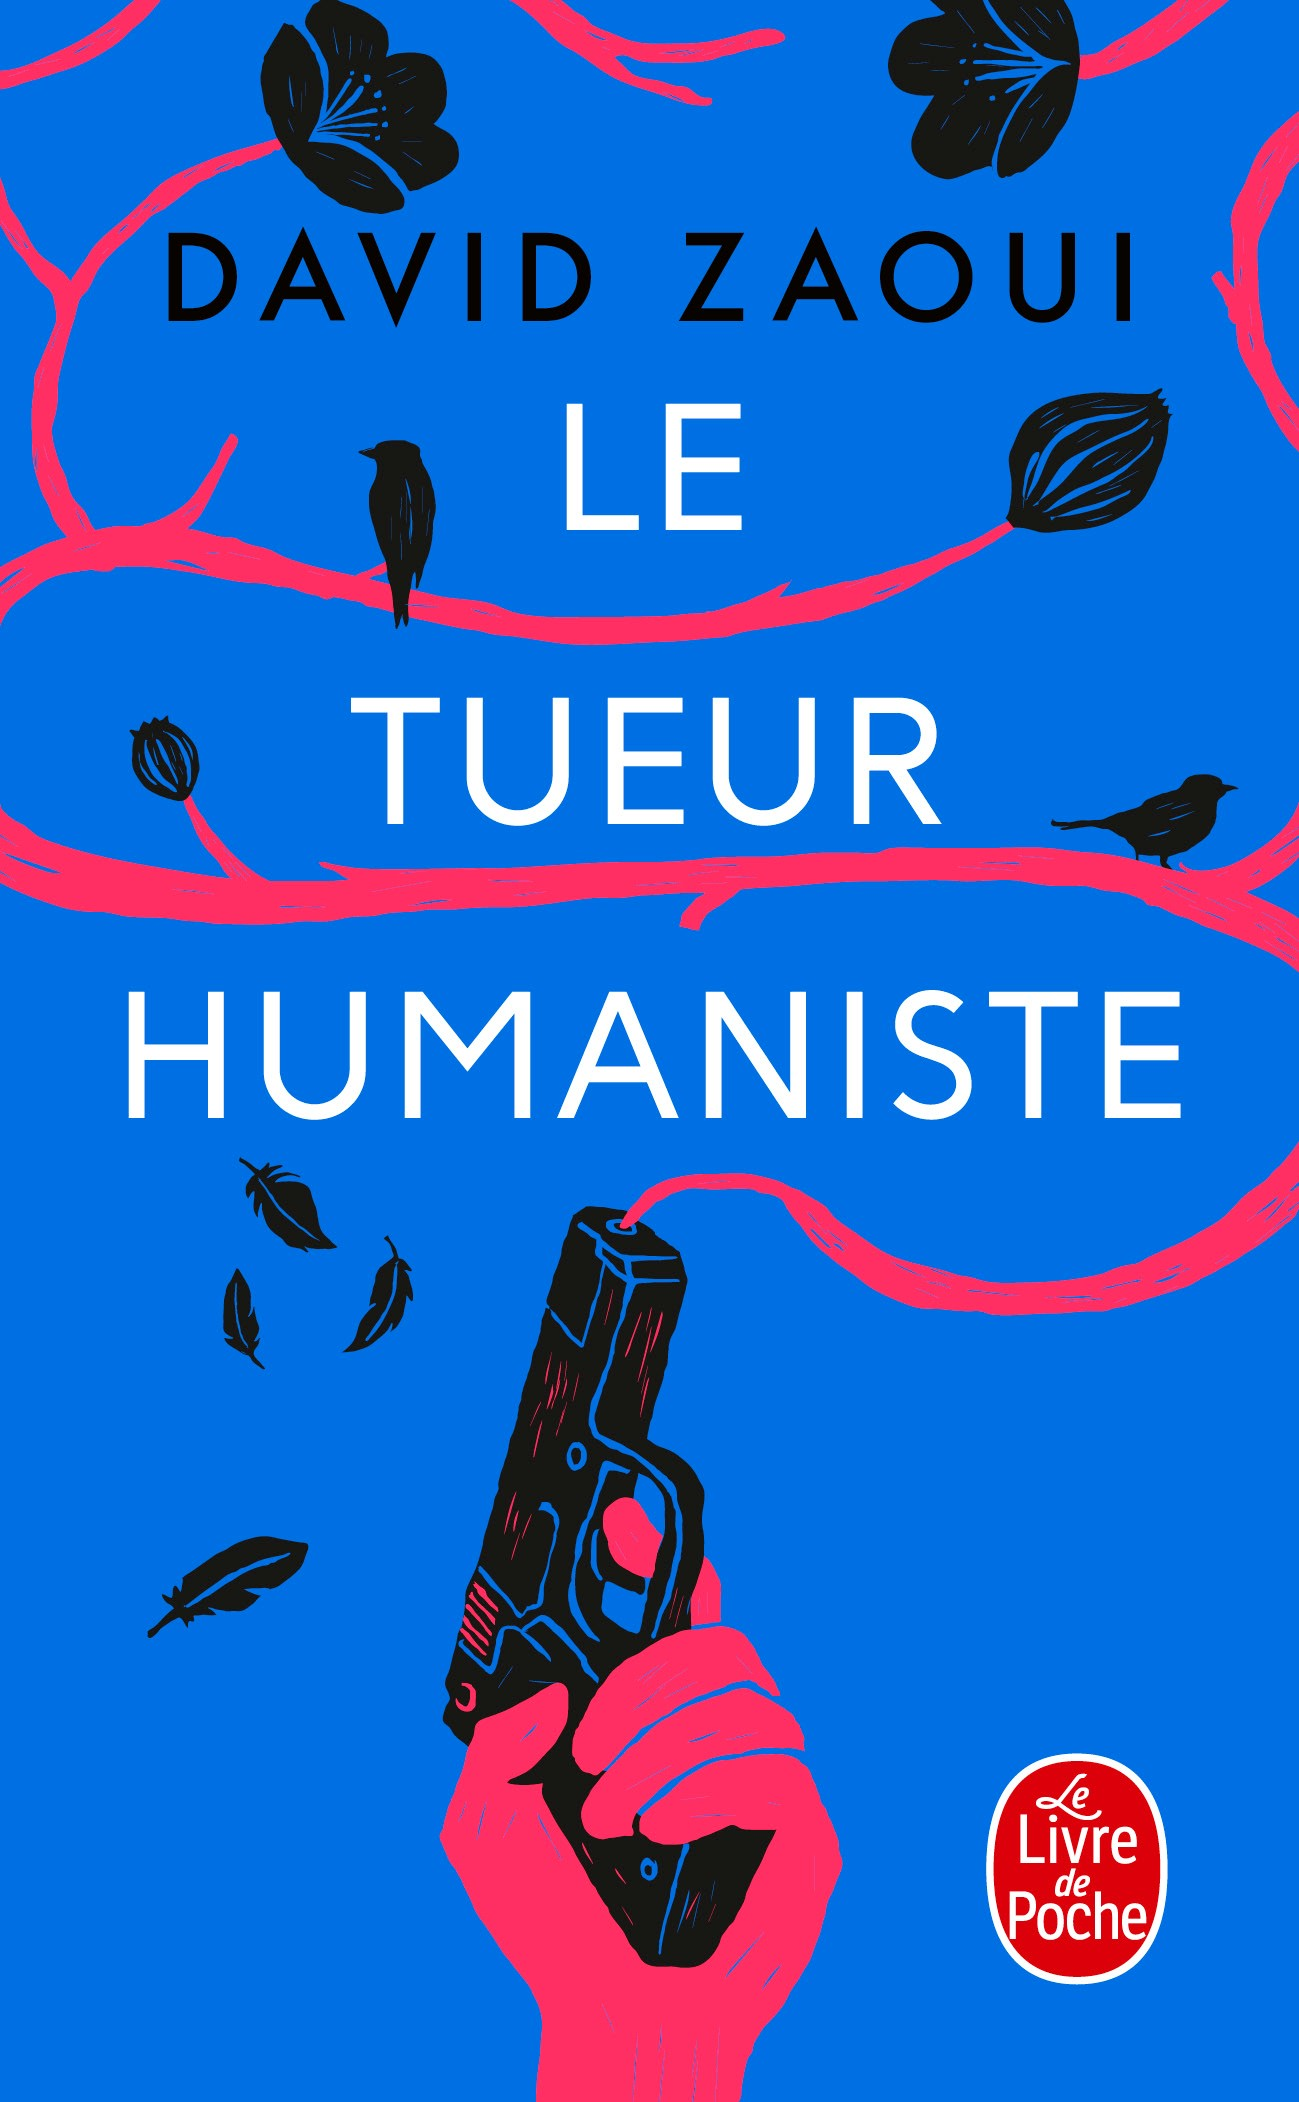 THE HUMANIST KILLER